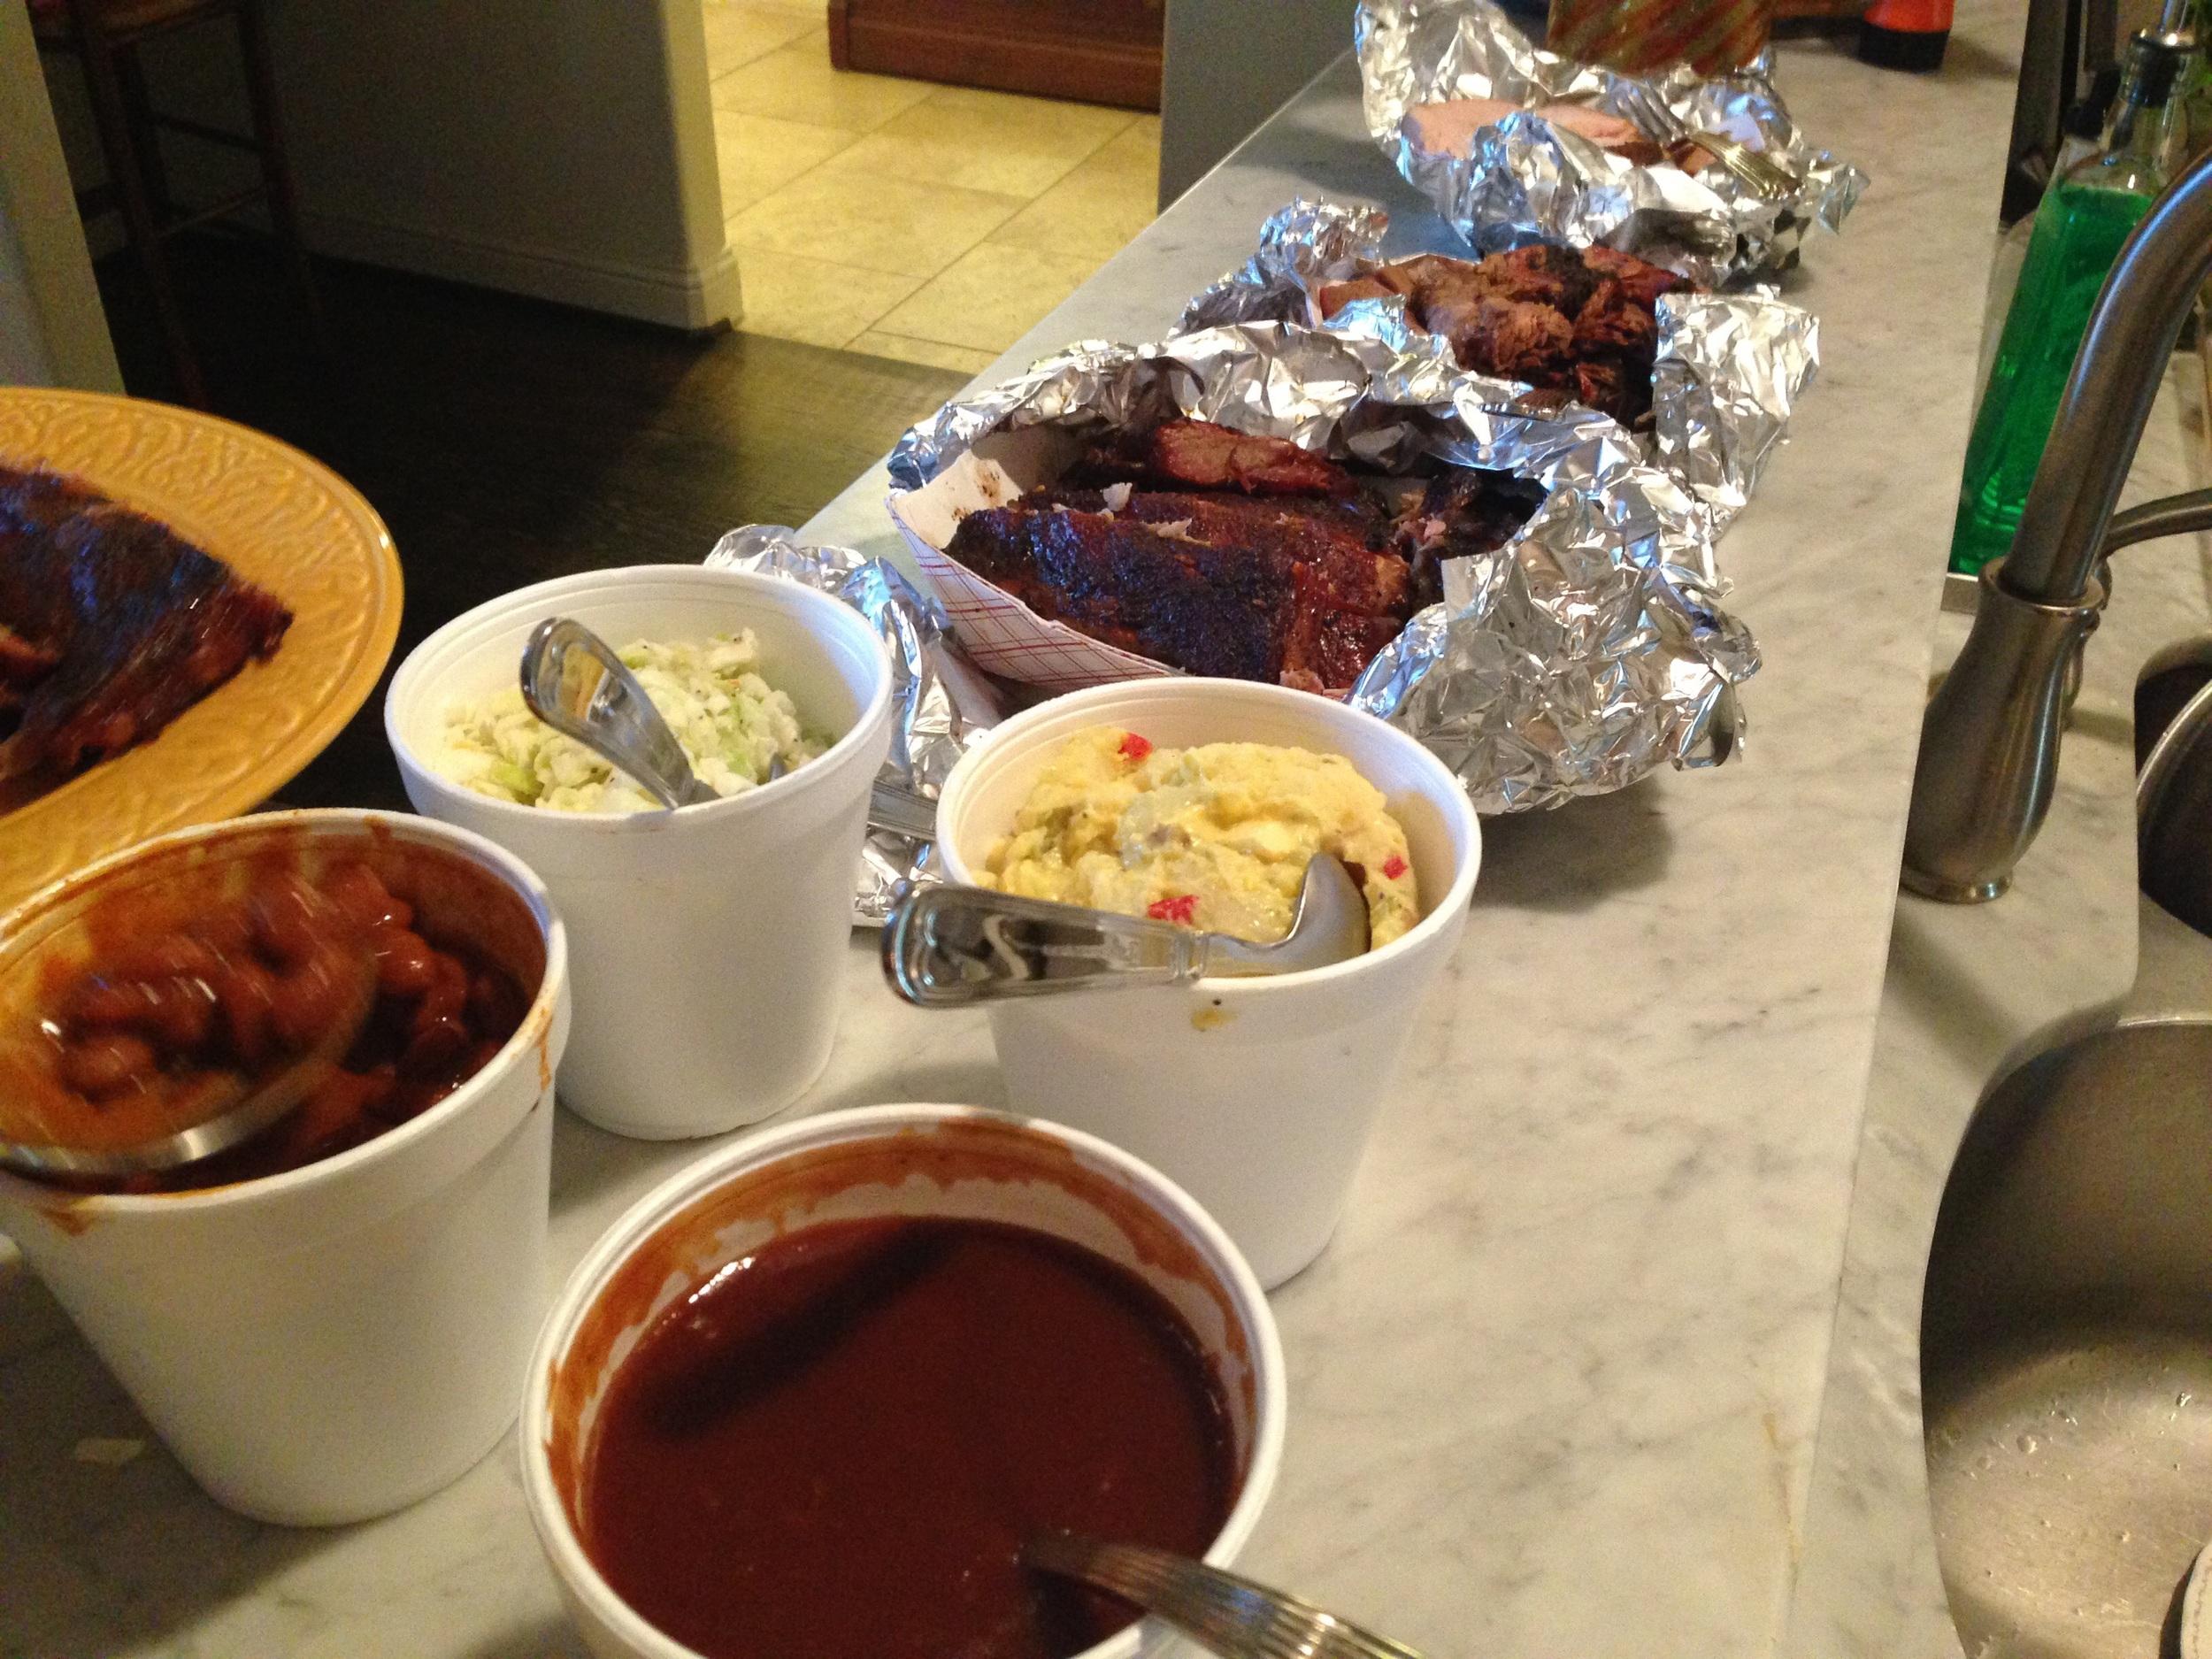 Brisket, Ribs, Turkey, Beans, Potato Salad and extra Barbecue Sauce